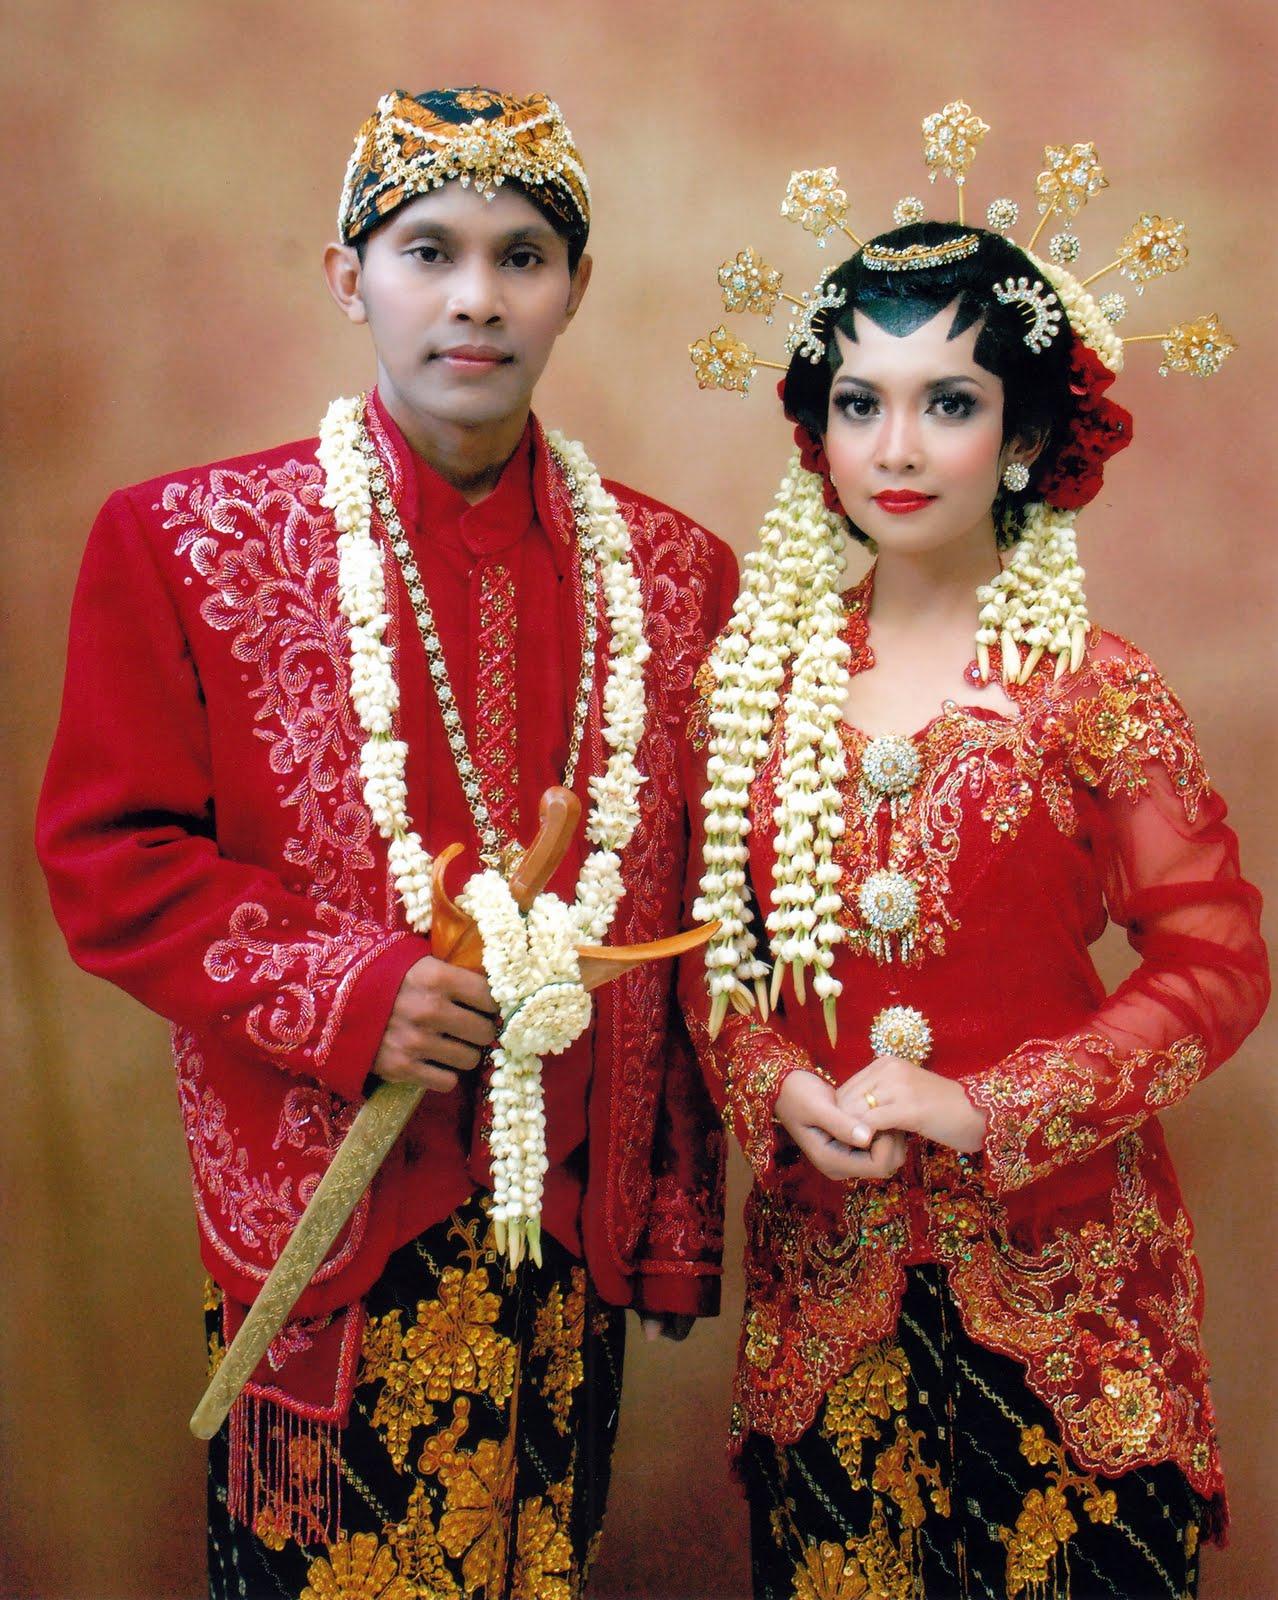 Foto Pernikahan Jawa 7